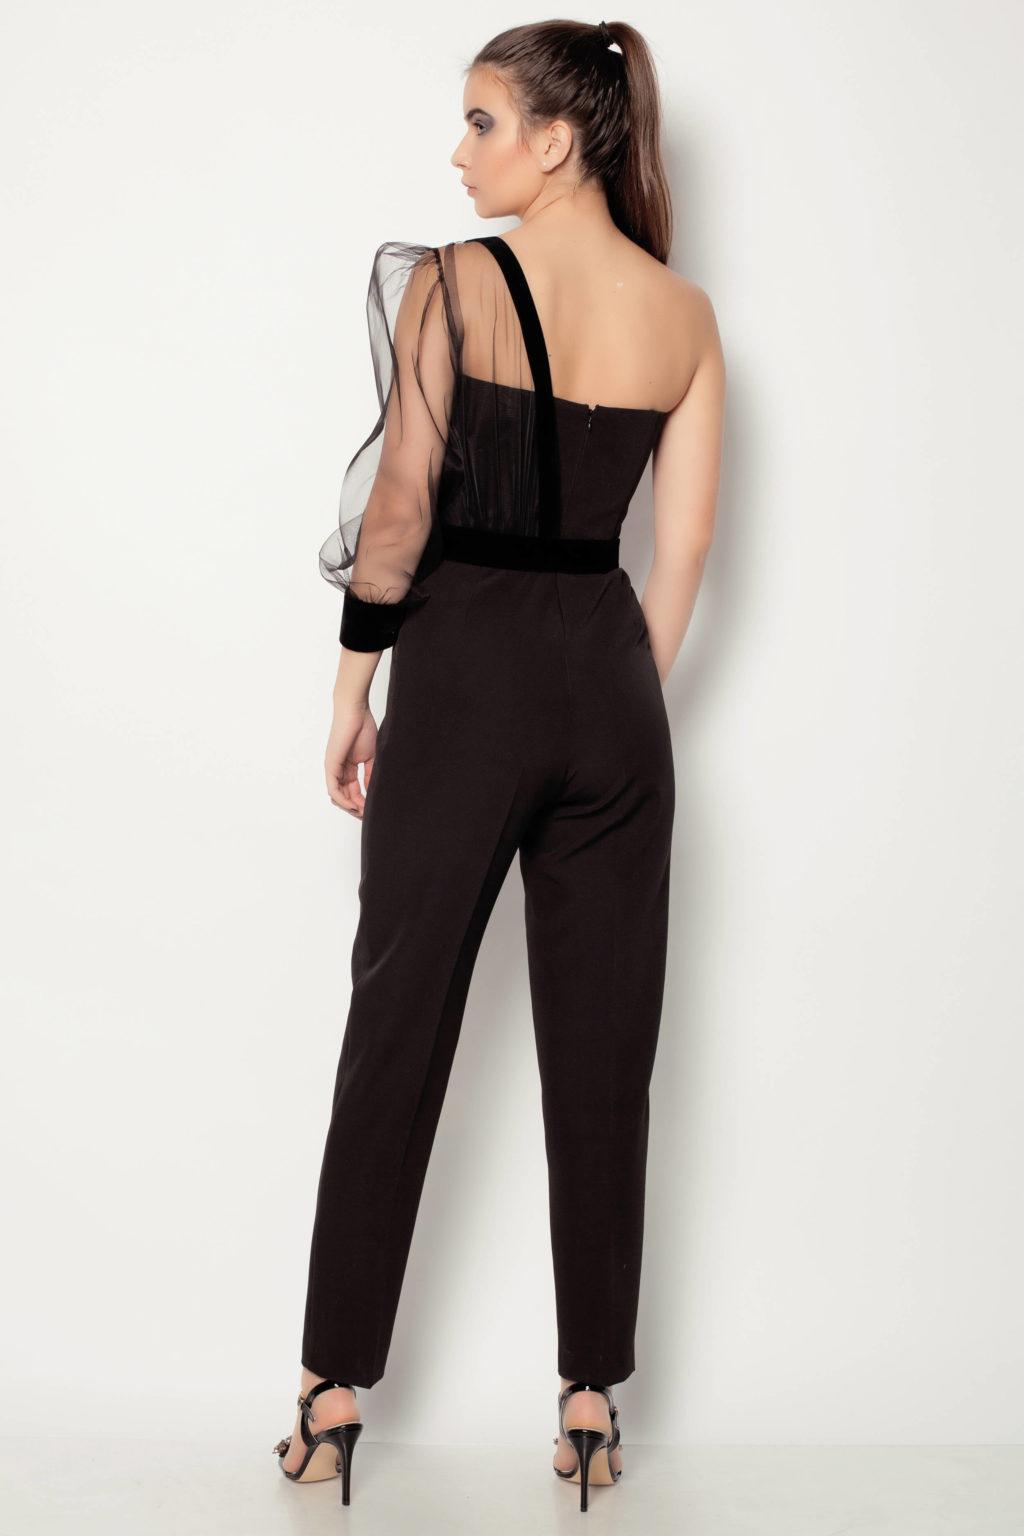 Salopeta neagra eleganta cu pantaloni pana marca Terra by C.